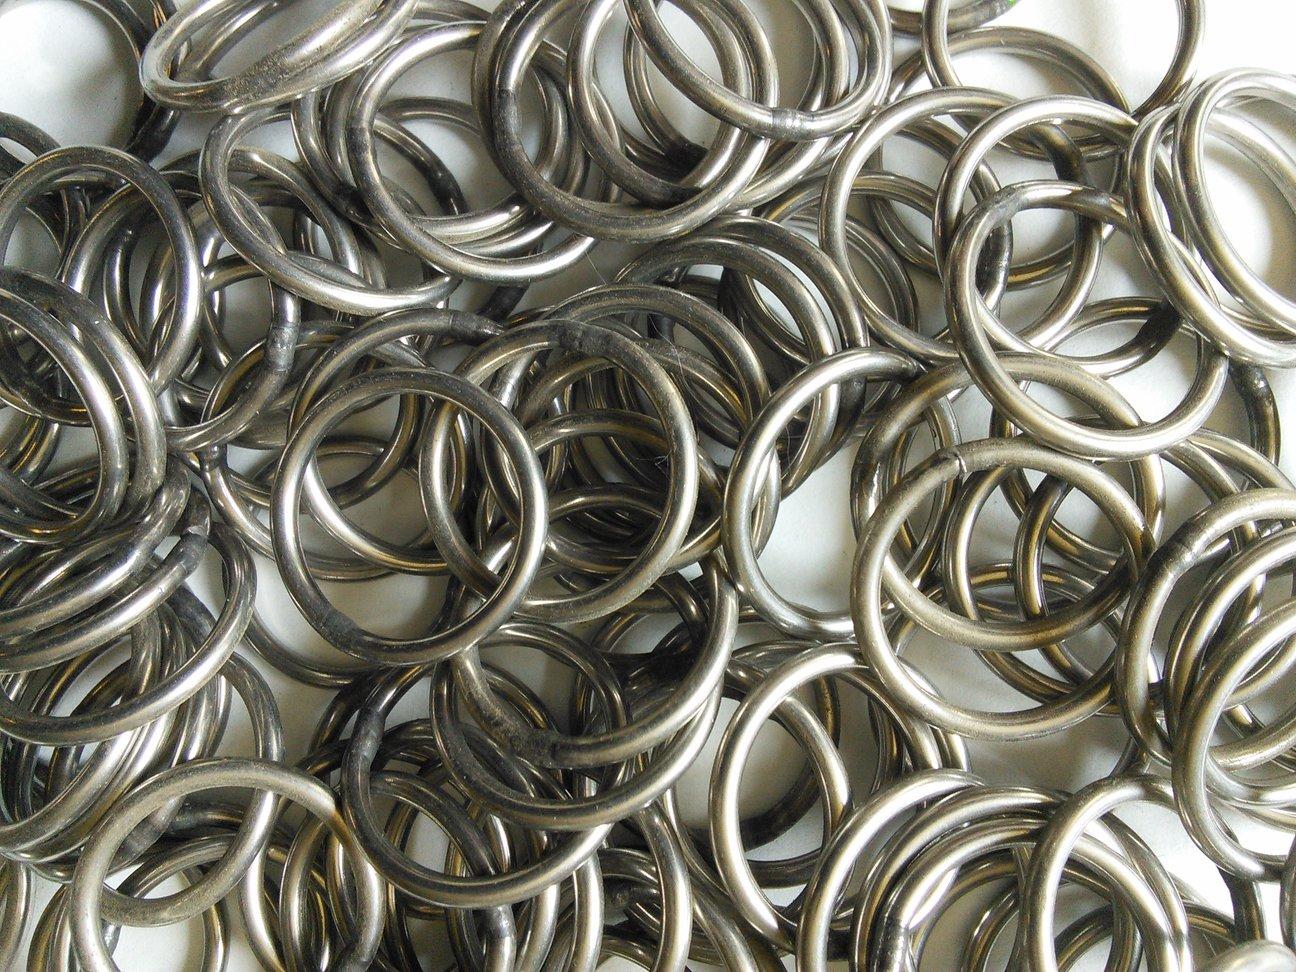 Custom welded rings